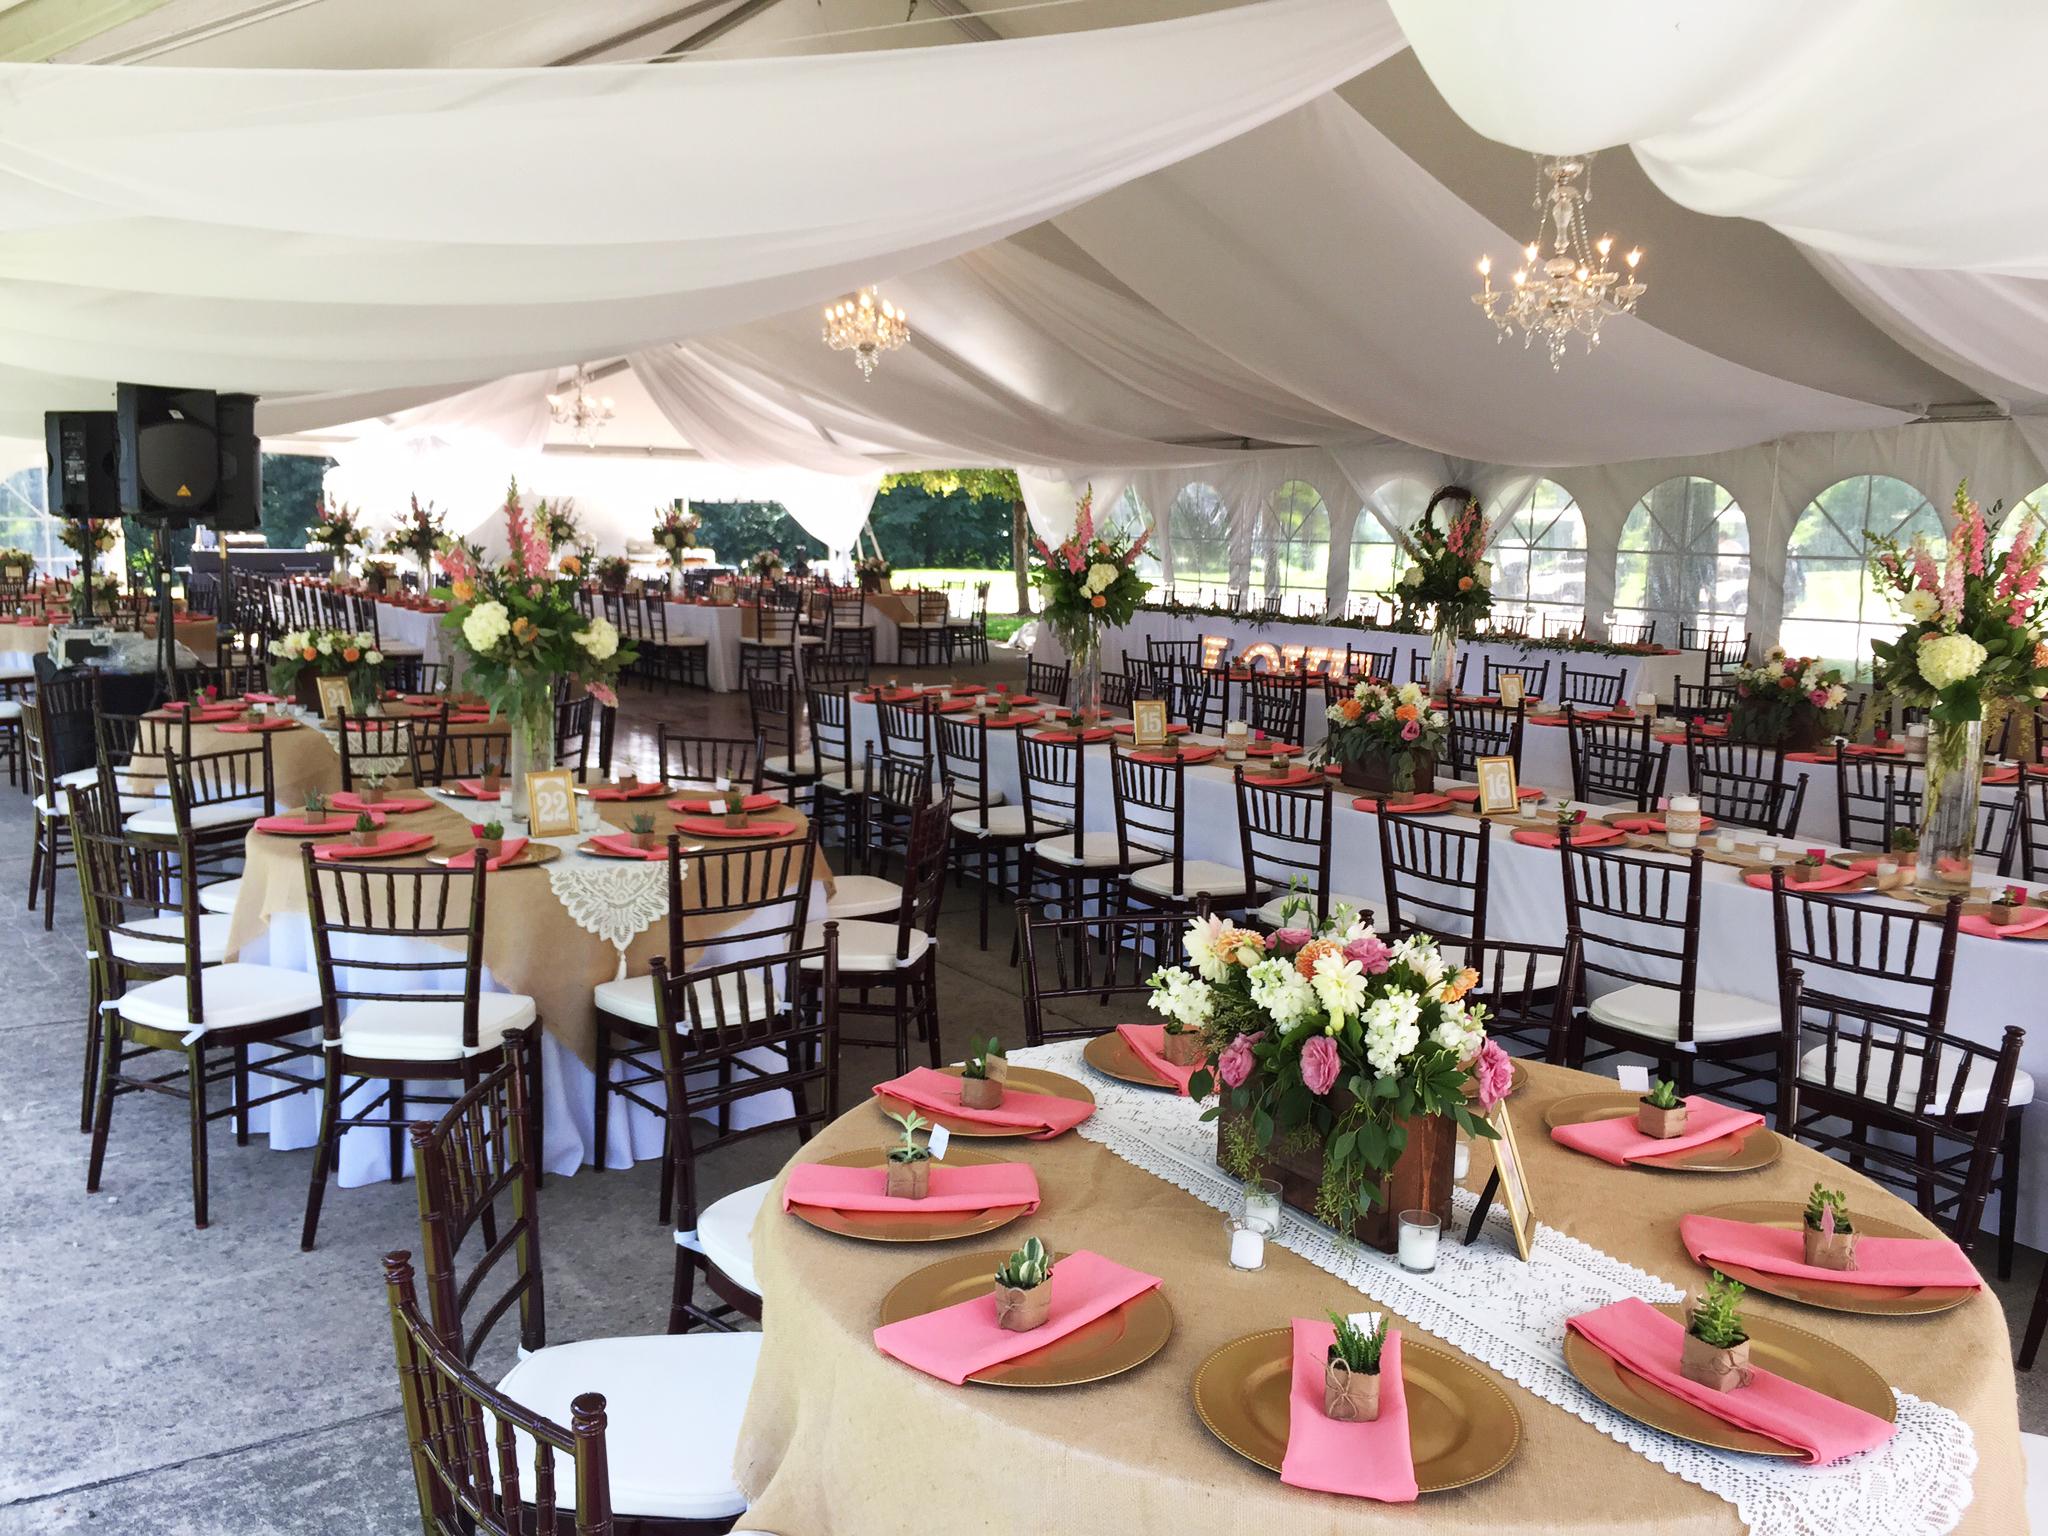 40' X 80' Hybrid Event Tent/structure Rental: Iowa, IL, MO